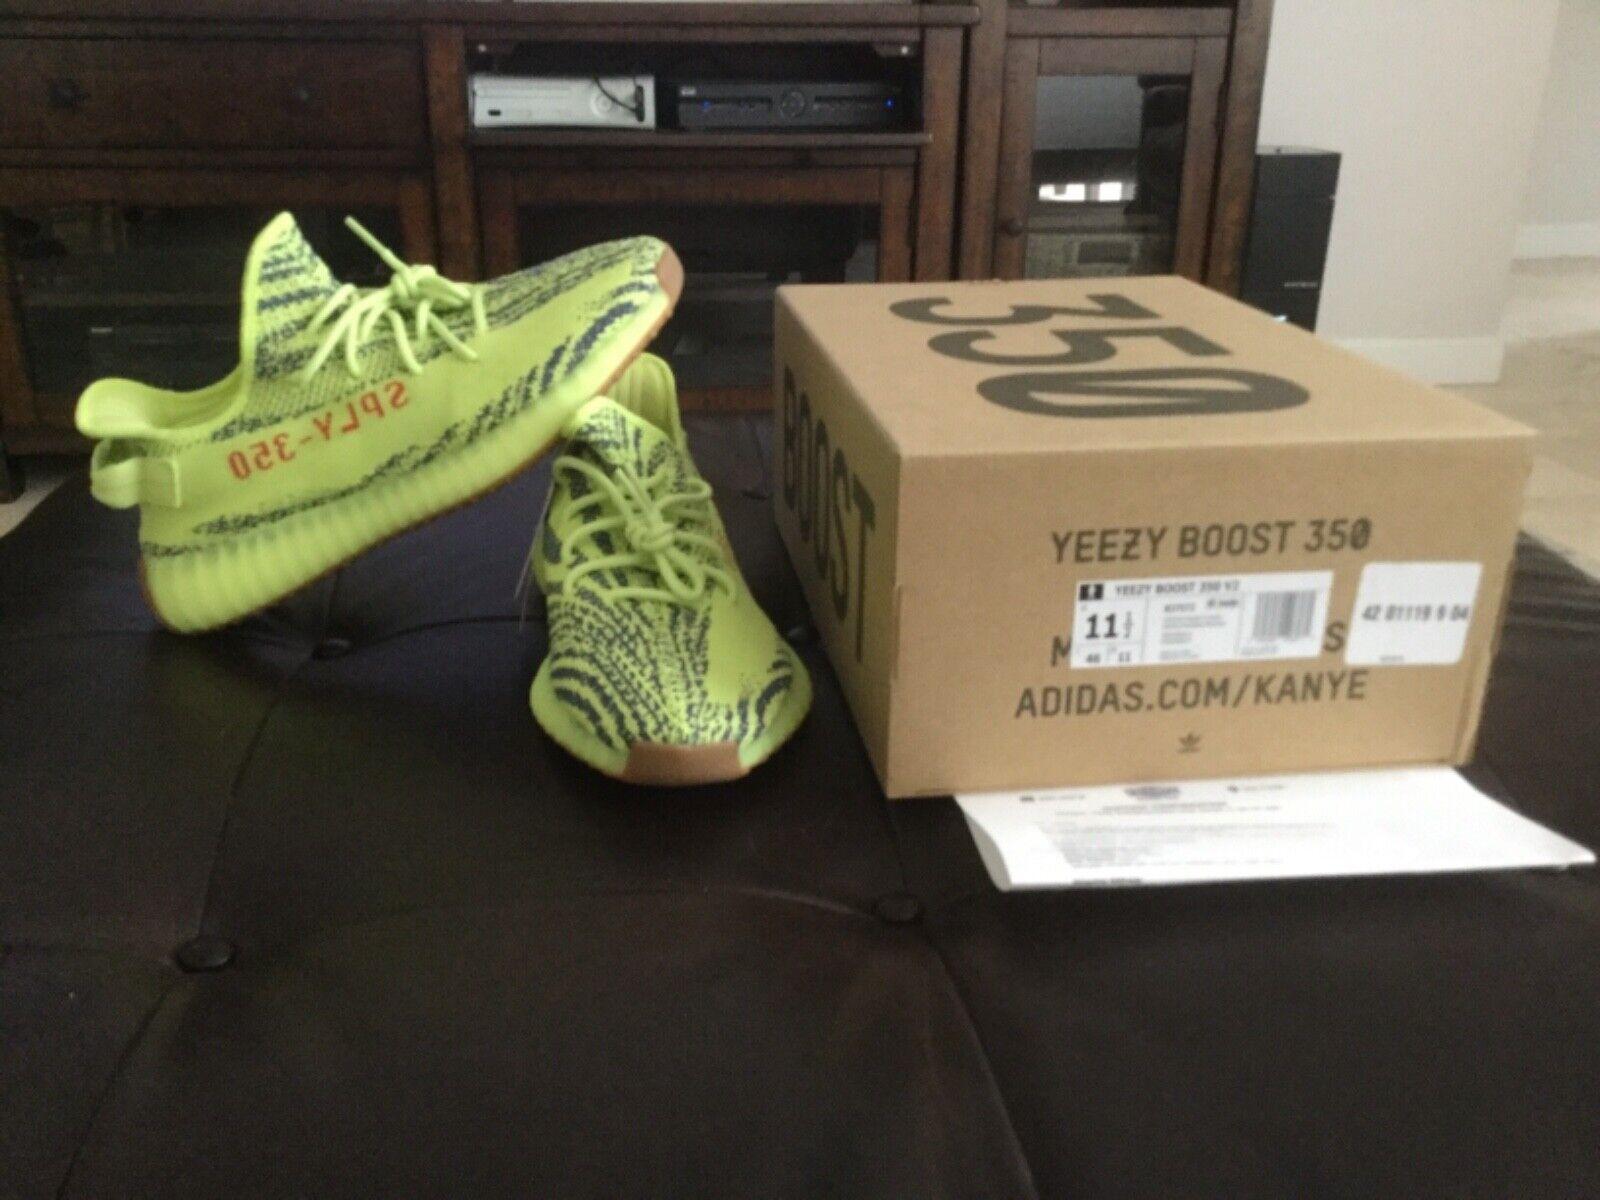 Adidas Yeezy Boost 350 V2 Frozen Yellow Semi Frozen,size11.5,Authentic w Receipt